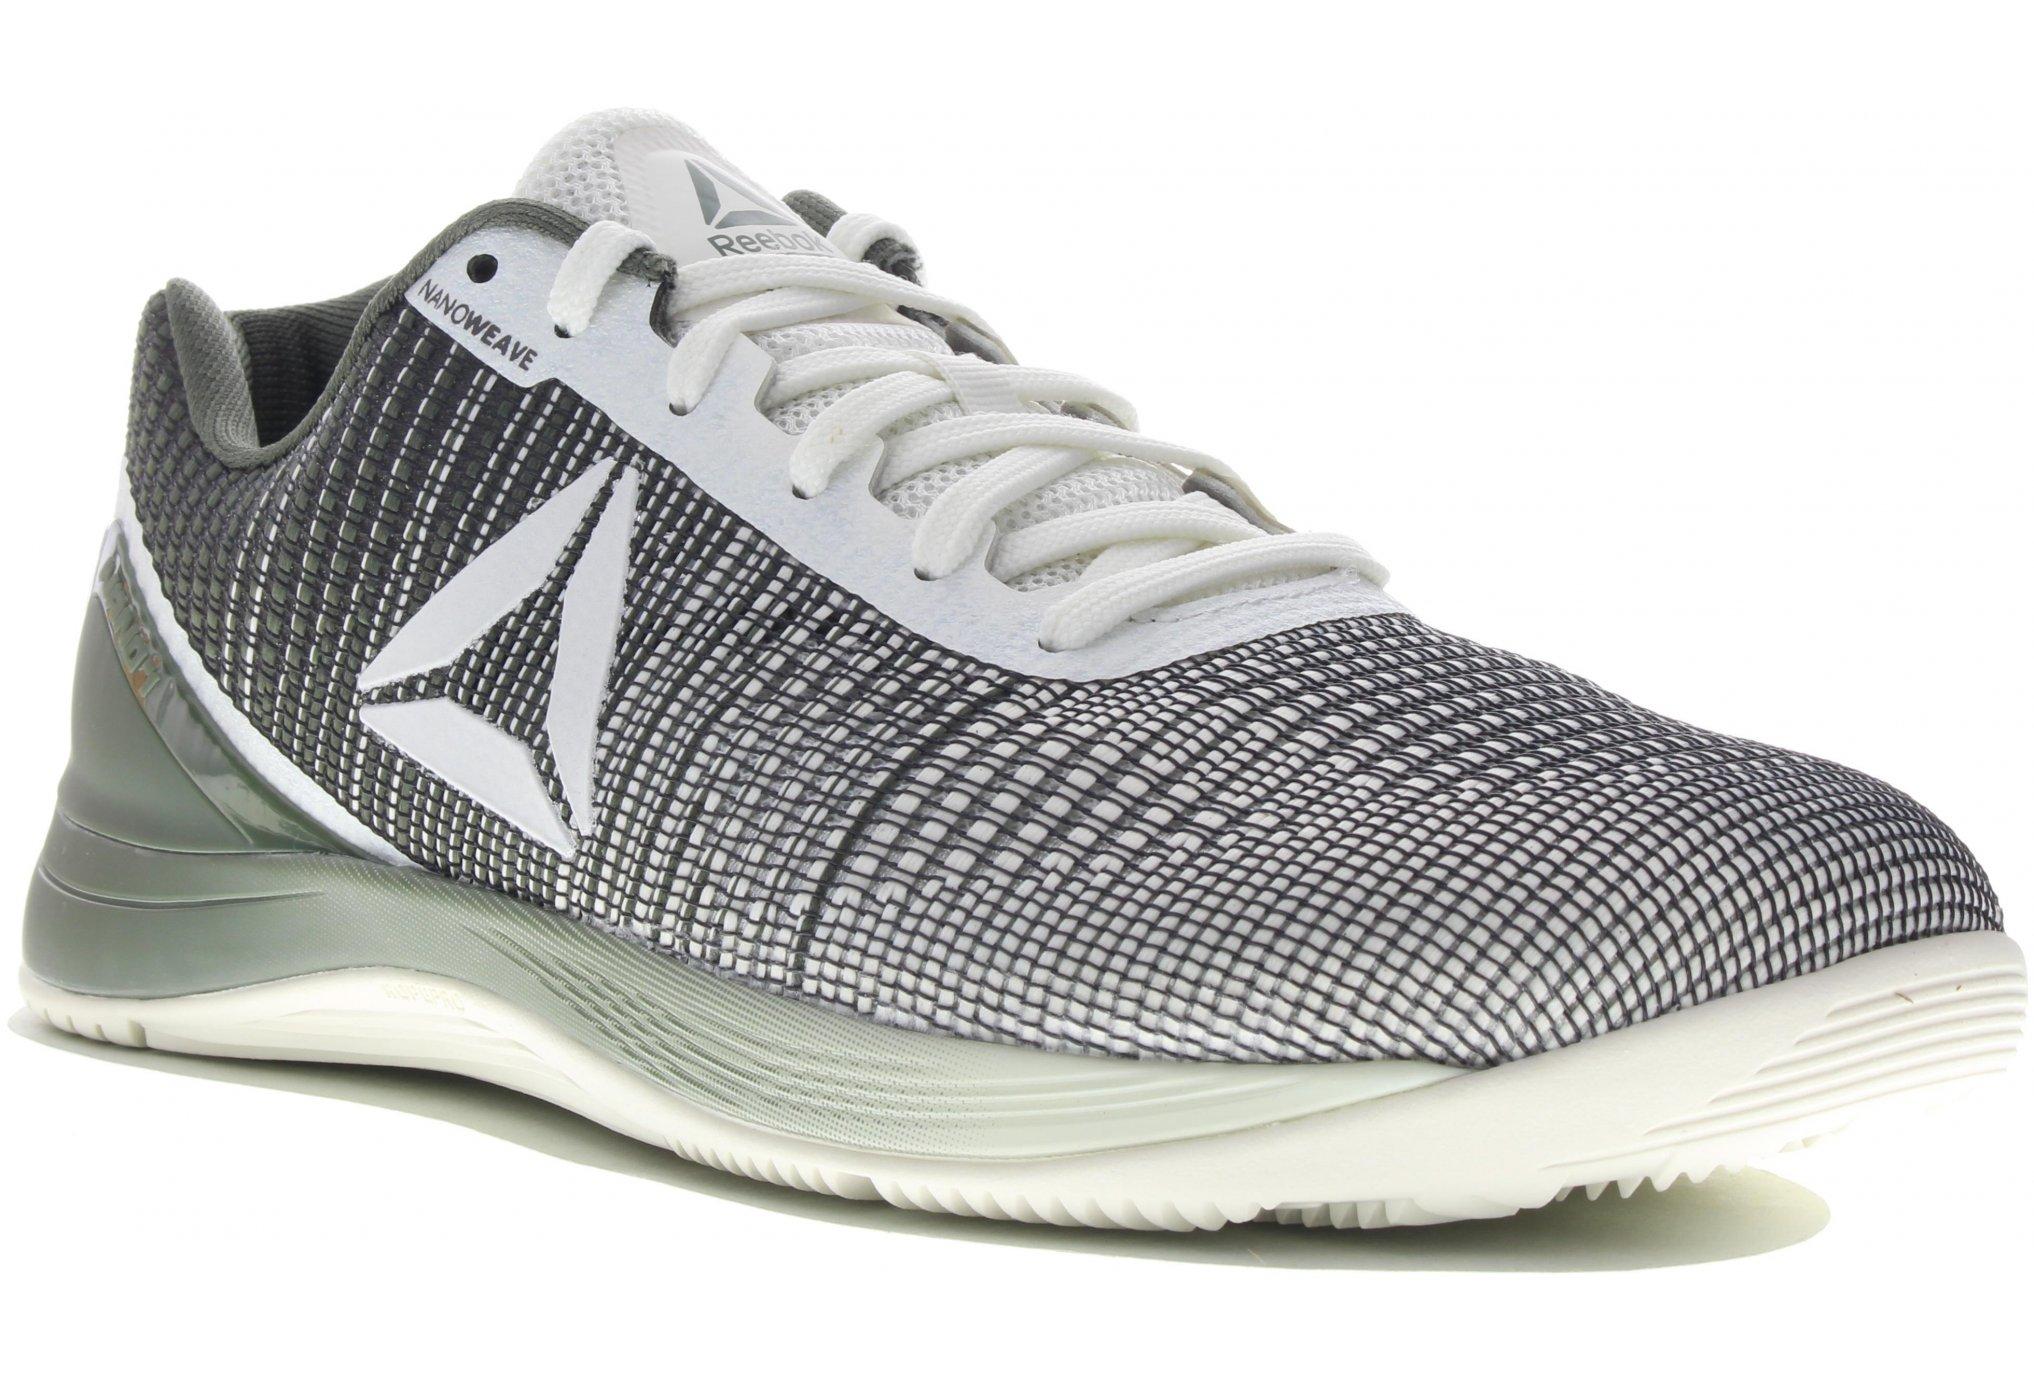 Reebok Crossfit Nano 7.0 Weave M Chaussures homme